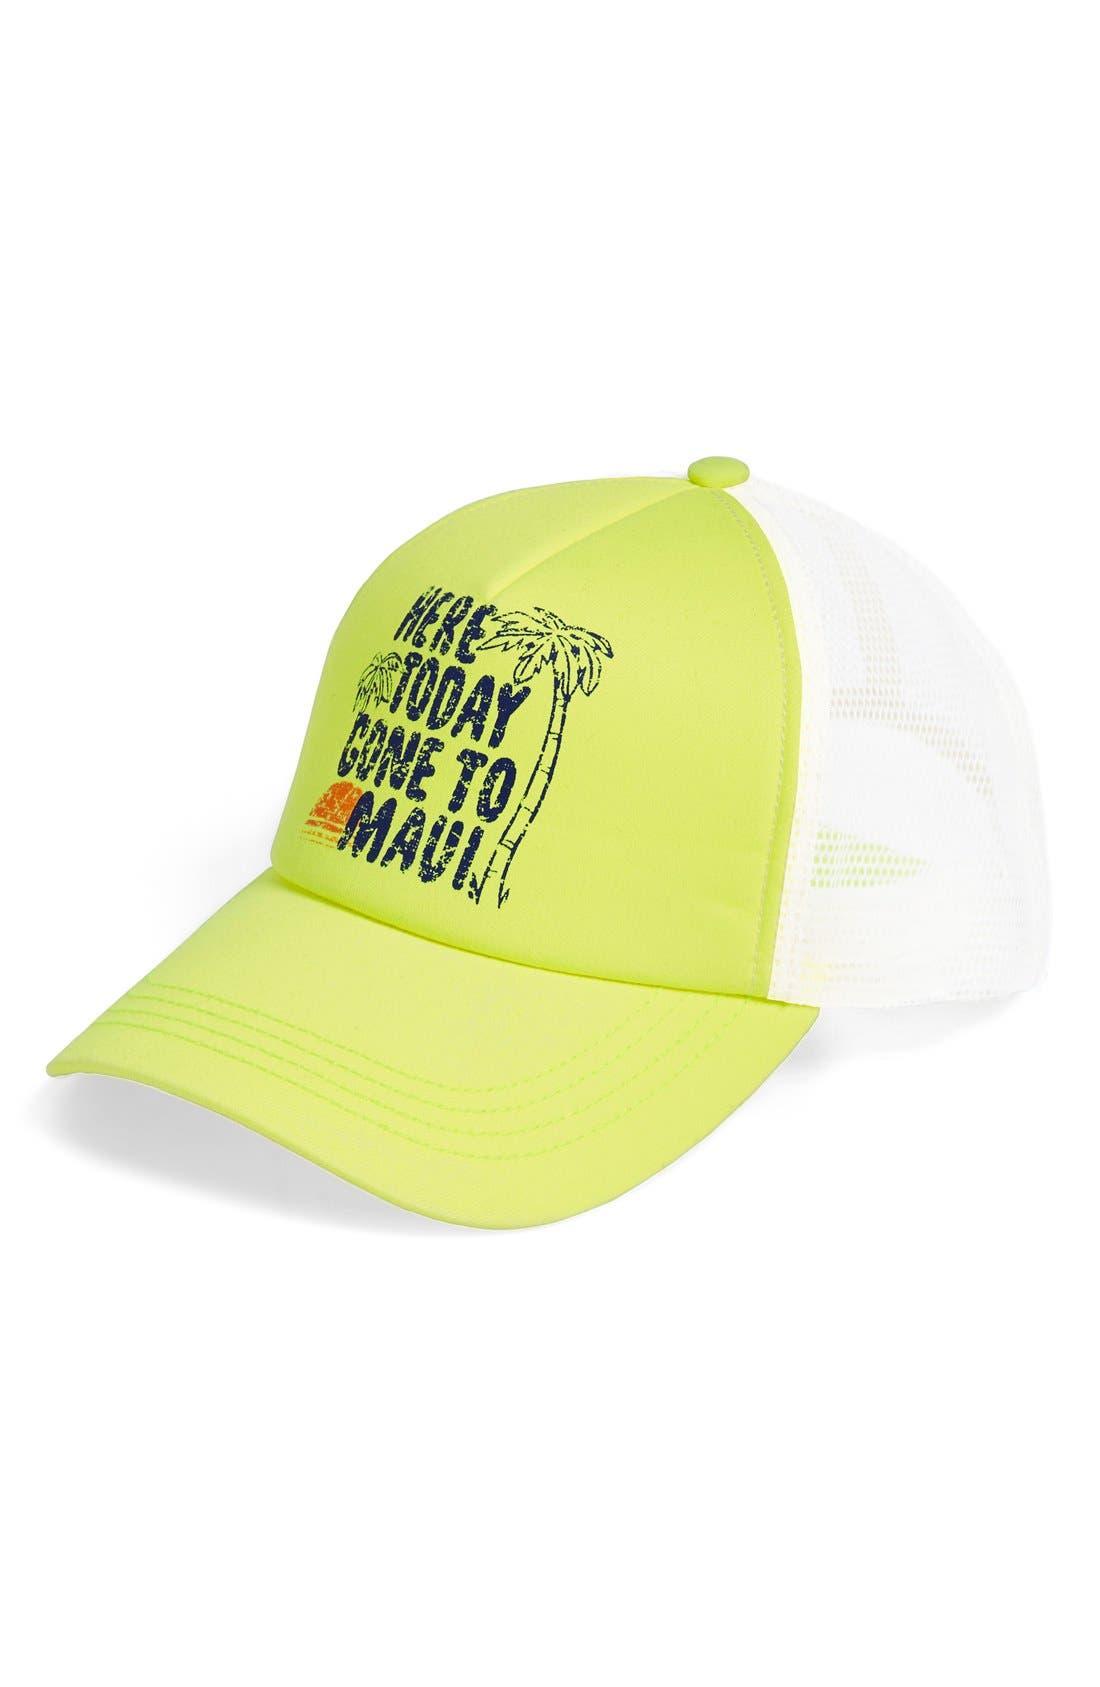 Alternate Image 1 Selected - Billabong Graphic Mesh Back Trucker Hat